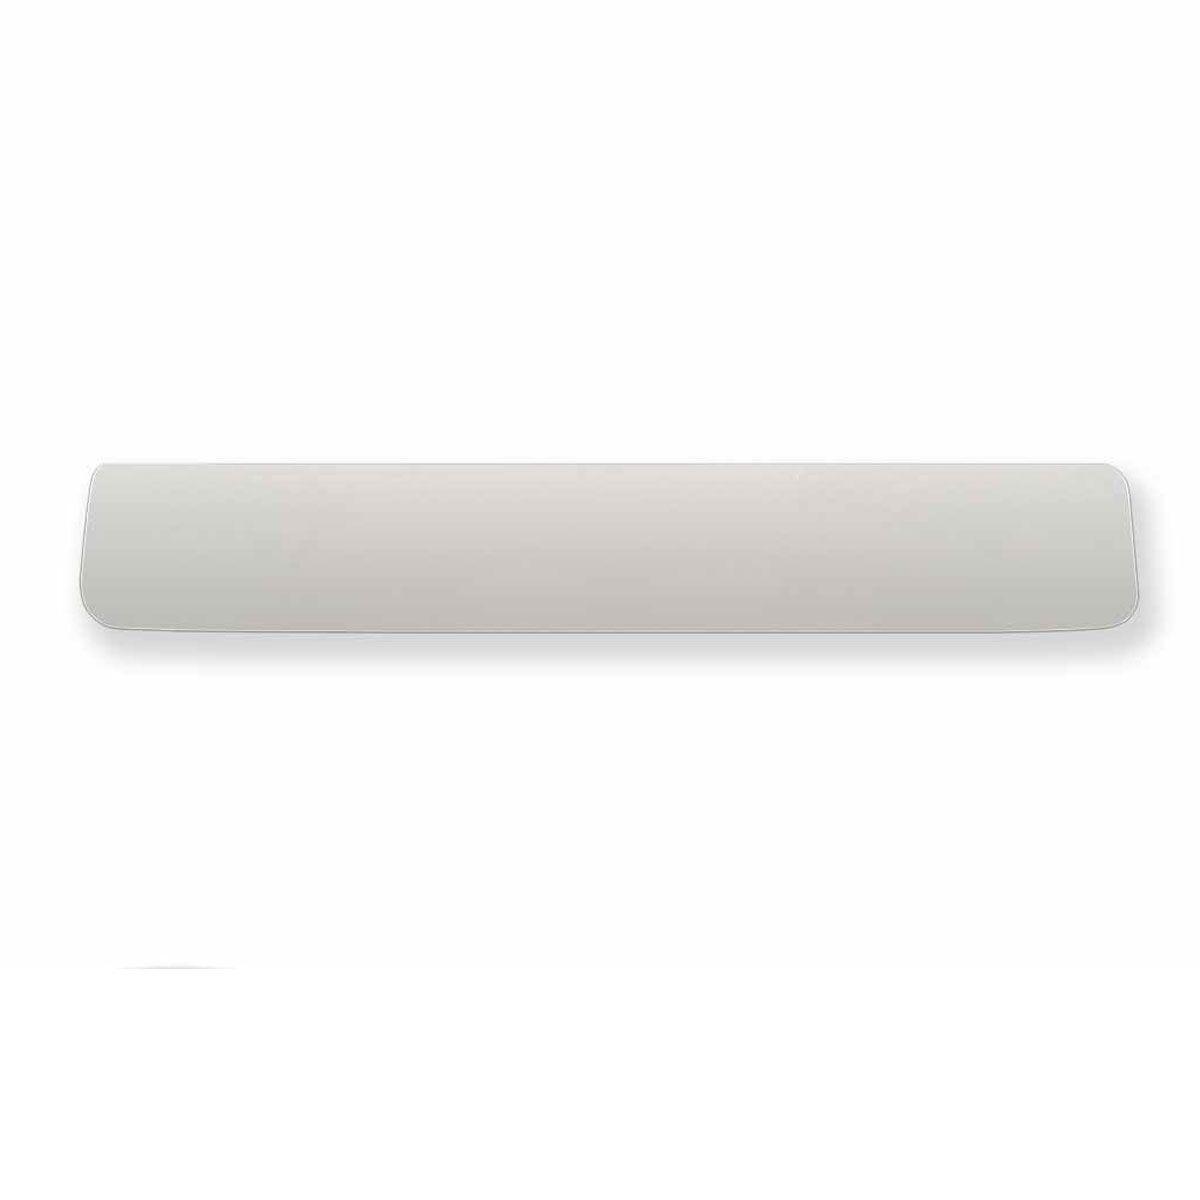 Lente Acrílico Frontal Volvo FH Globetroter Branco